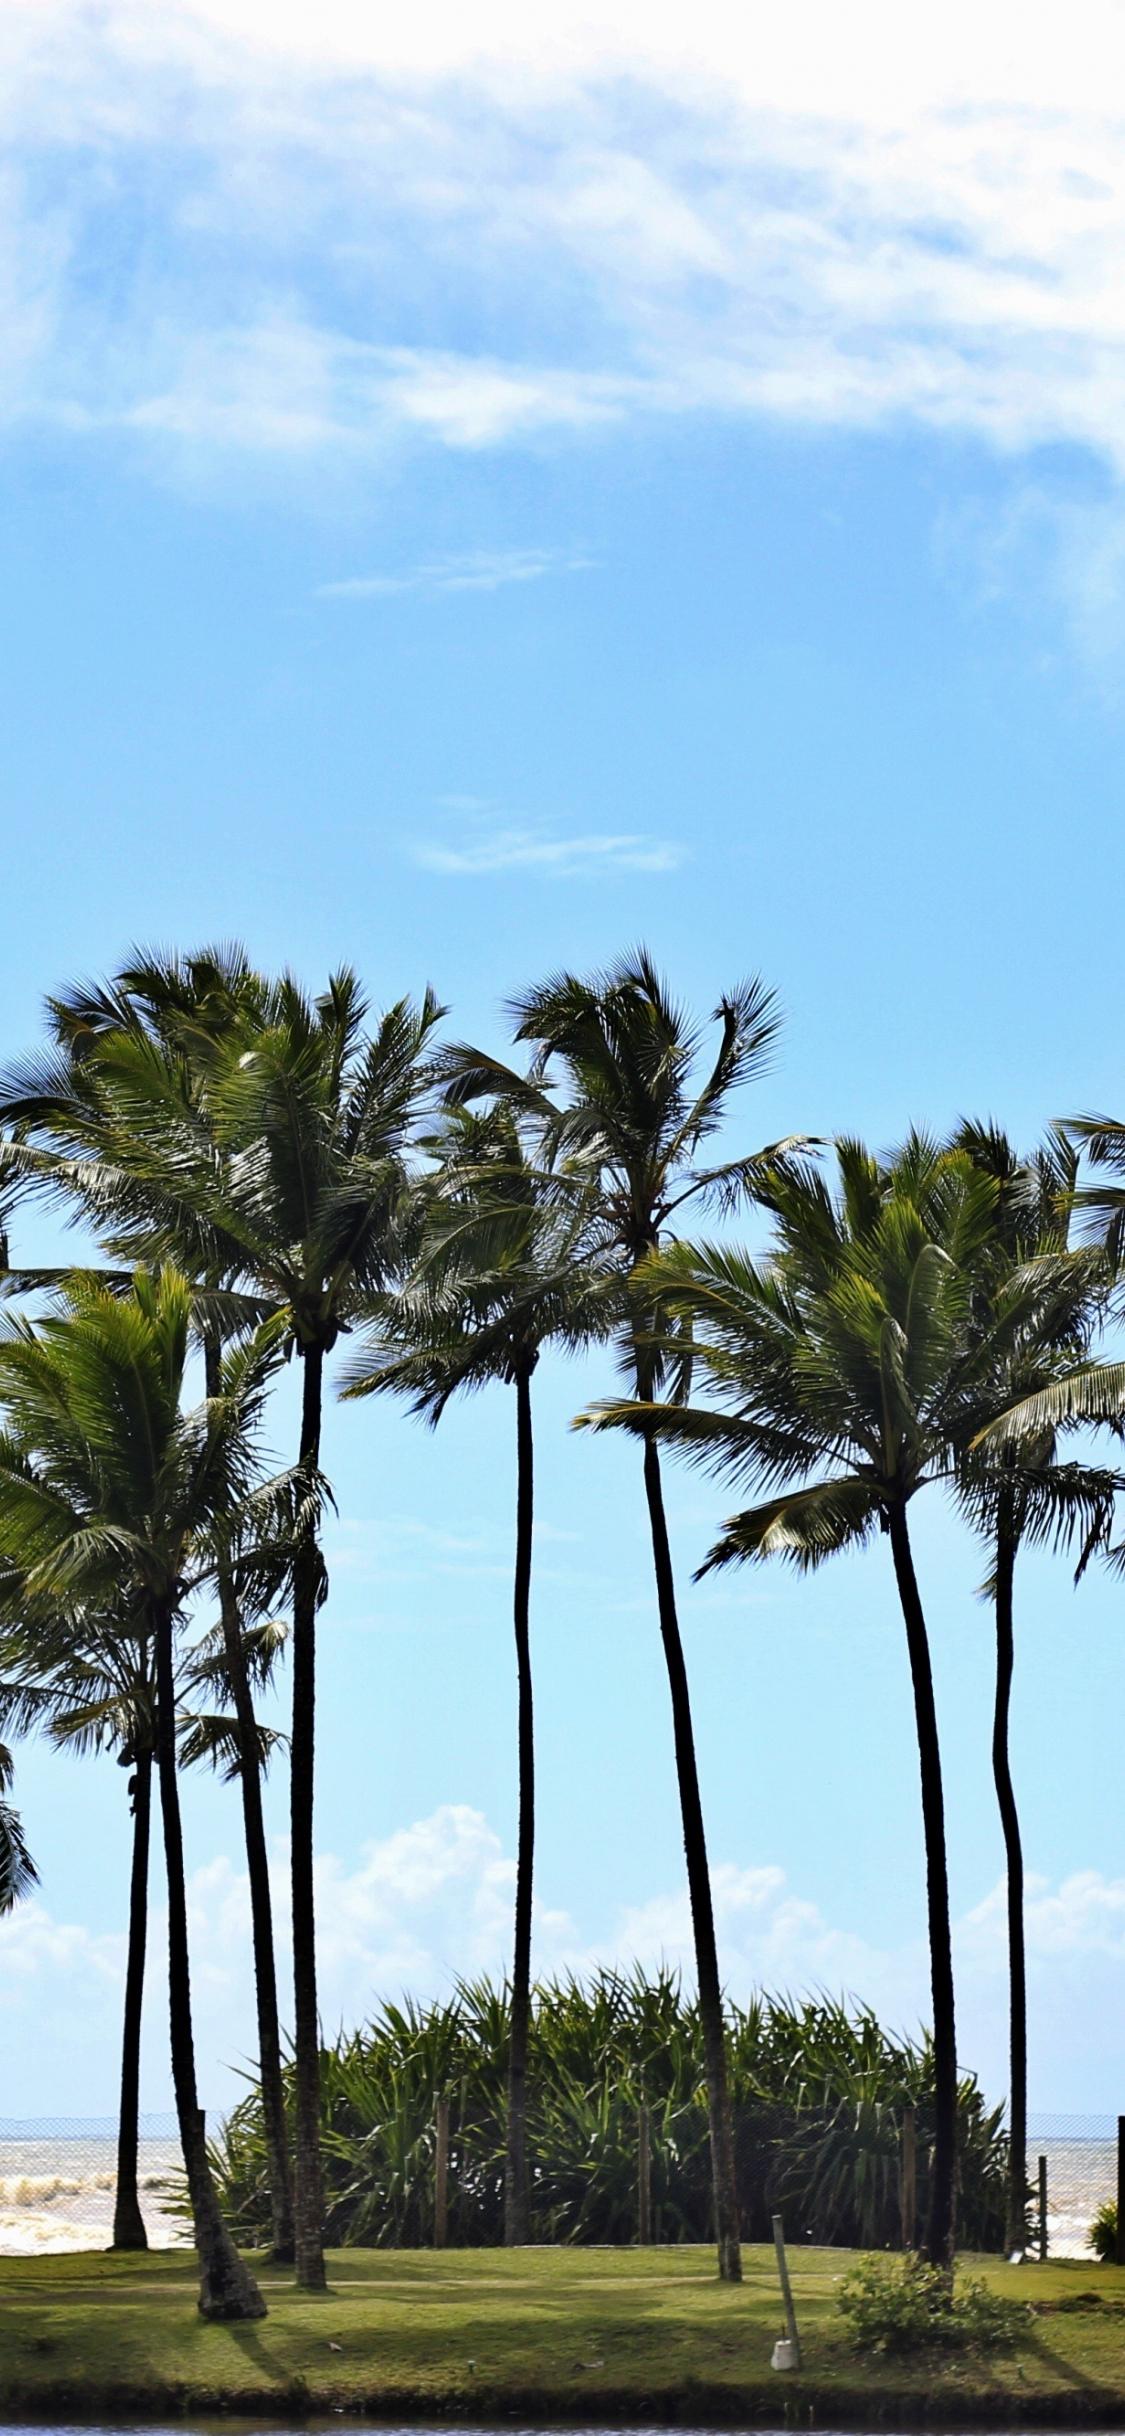 Download 1125x2436 Wallpaper Palm Trees Blue Sky Coast